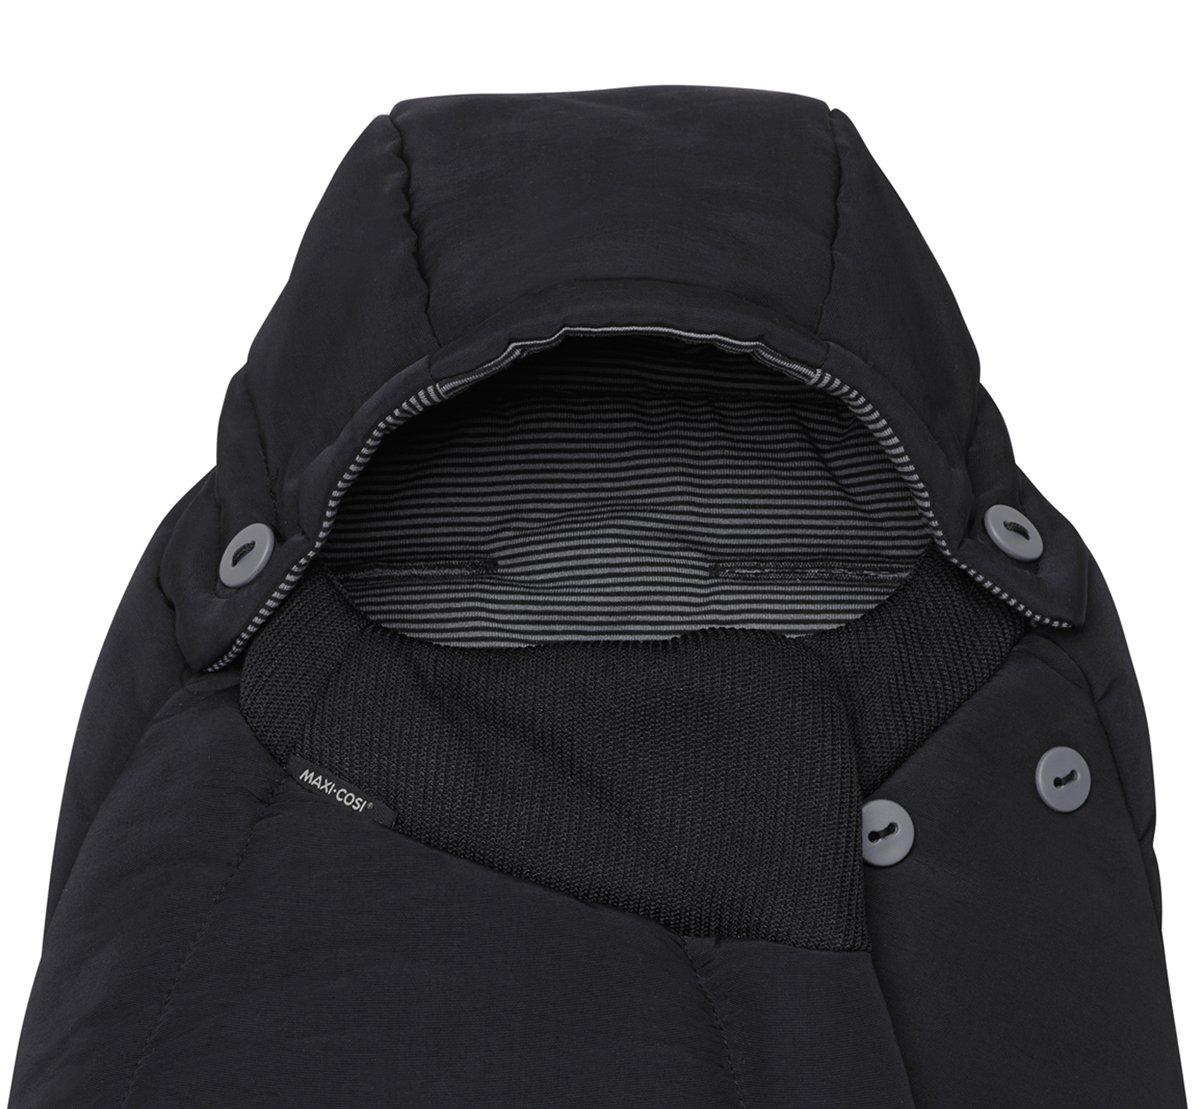 Saco de cochecito Maxi-Cosi general negro Black Raven